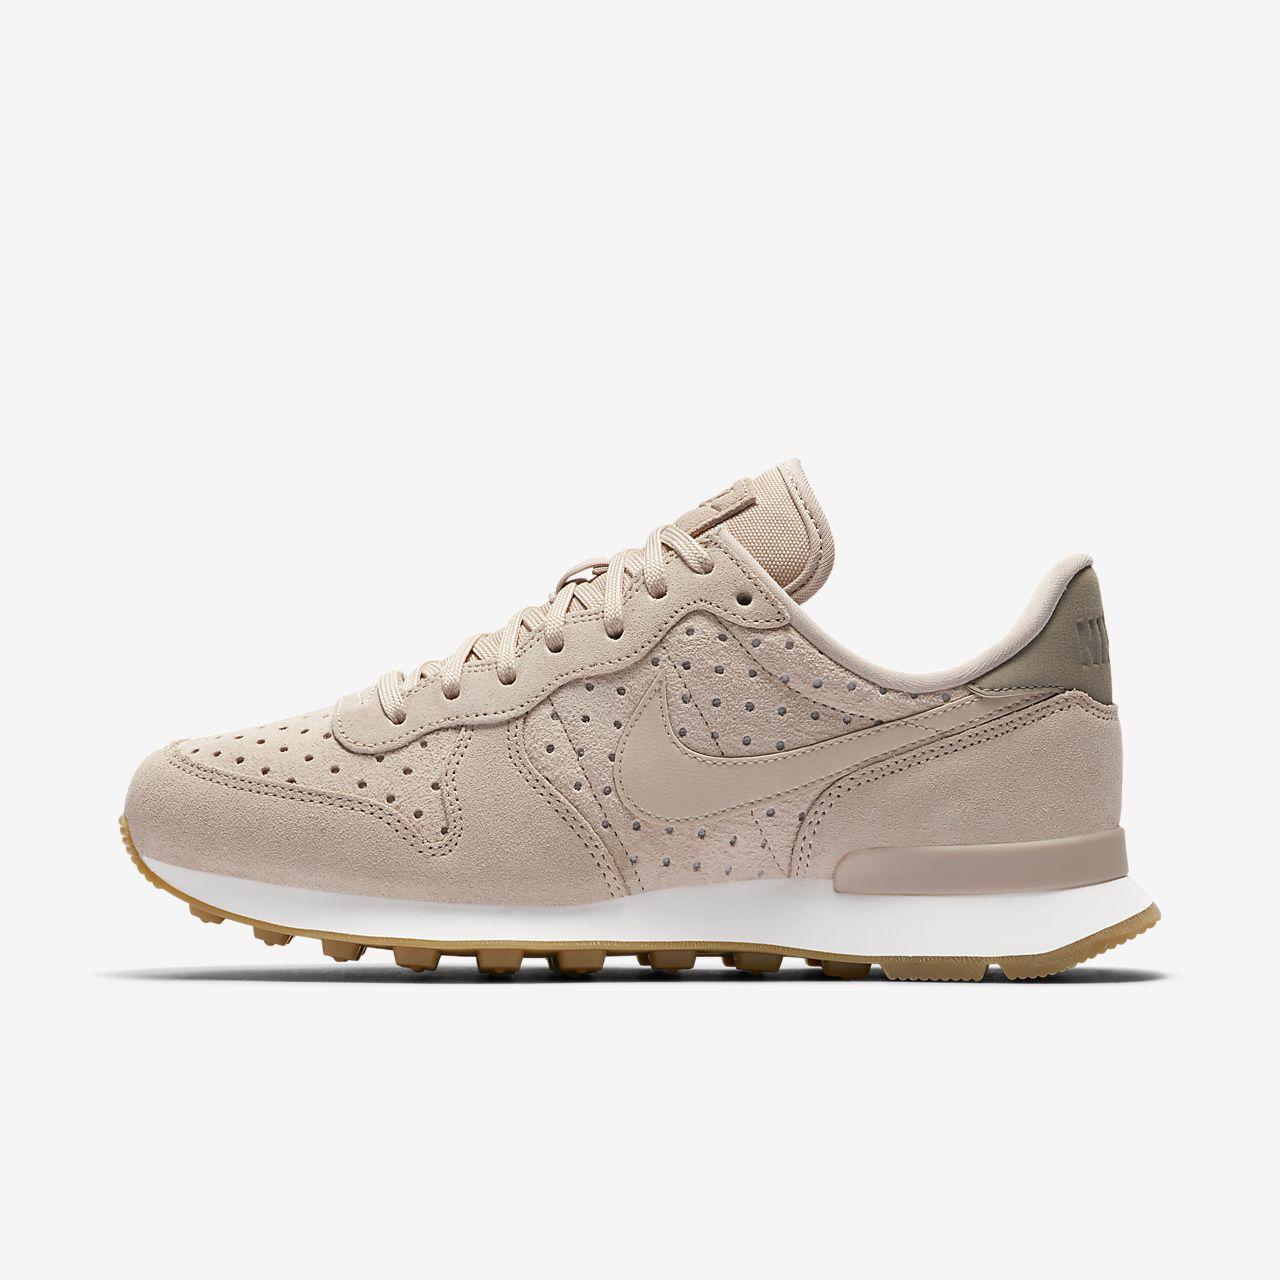 Low Resolution Nike Internationalist Premium Women's Shoe Nike  Internationalist Premium Women's Shoe